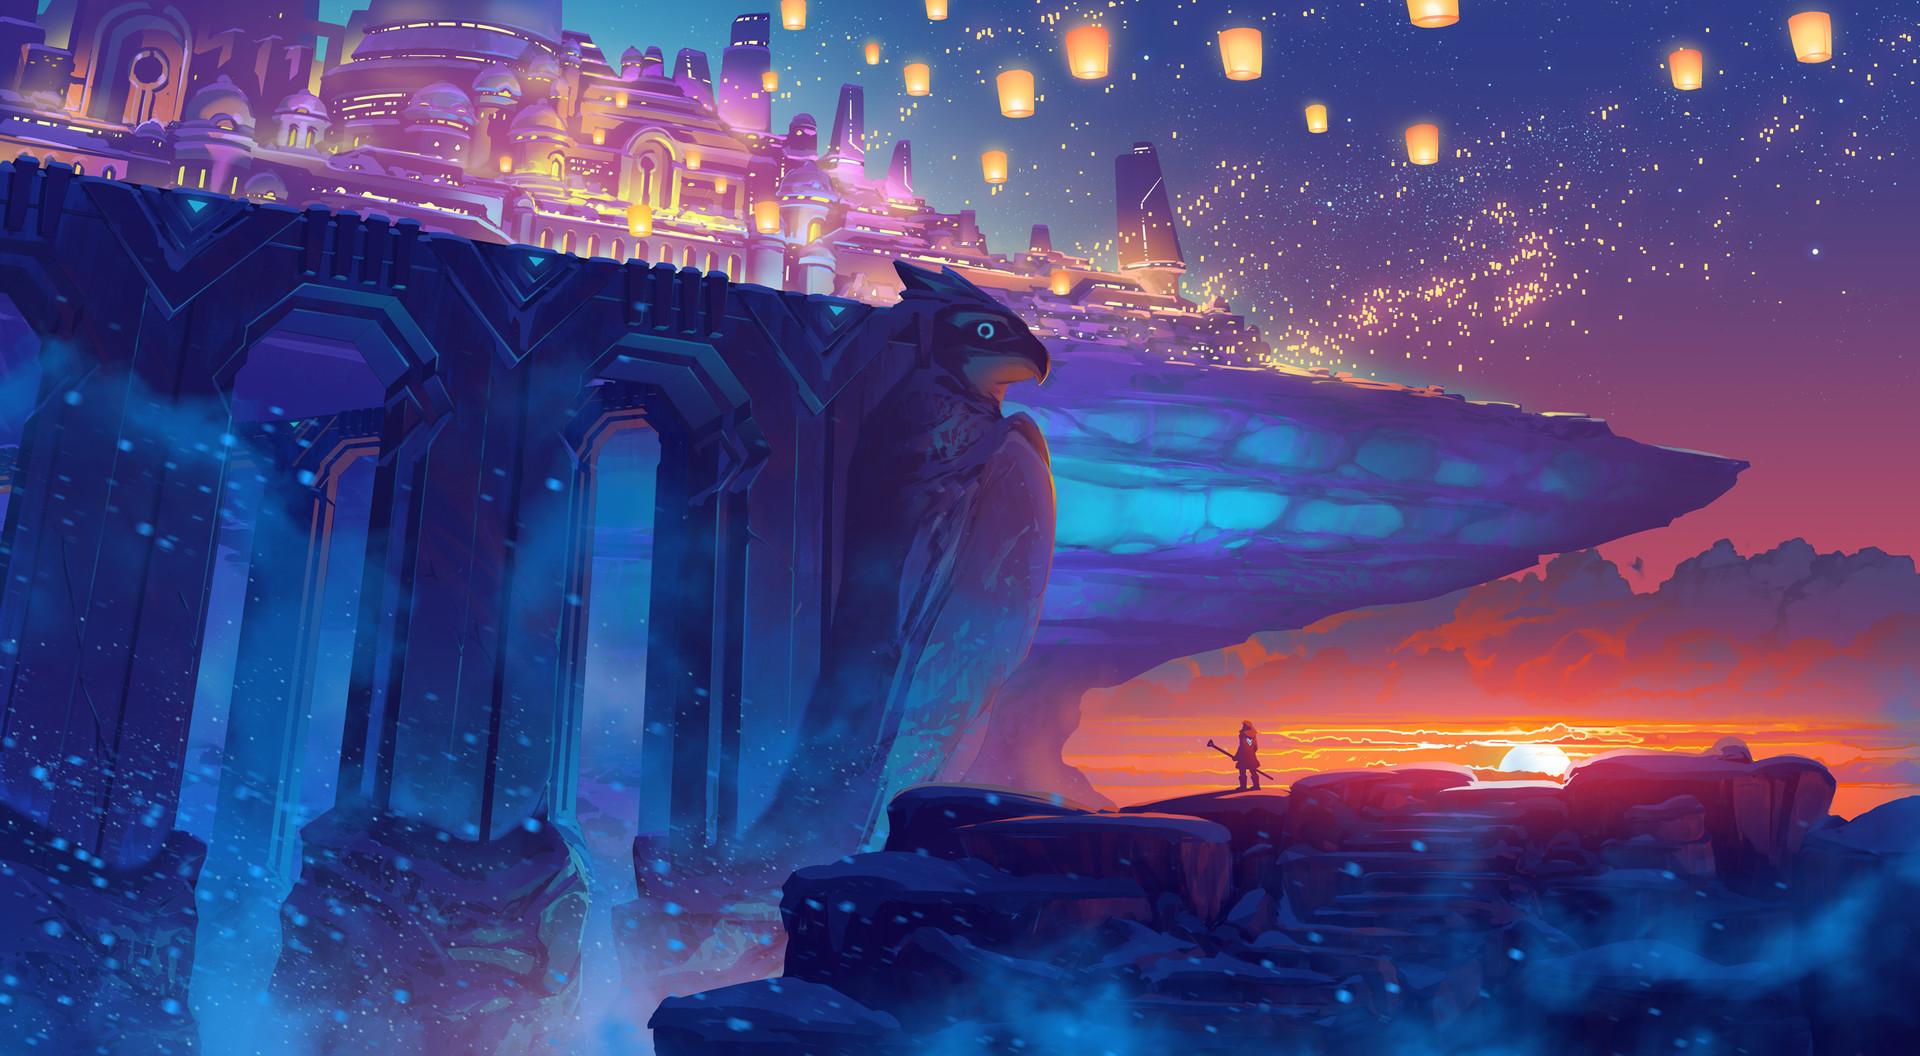 Artstation - Duelyst Frostfire Festival Counterplay Games